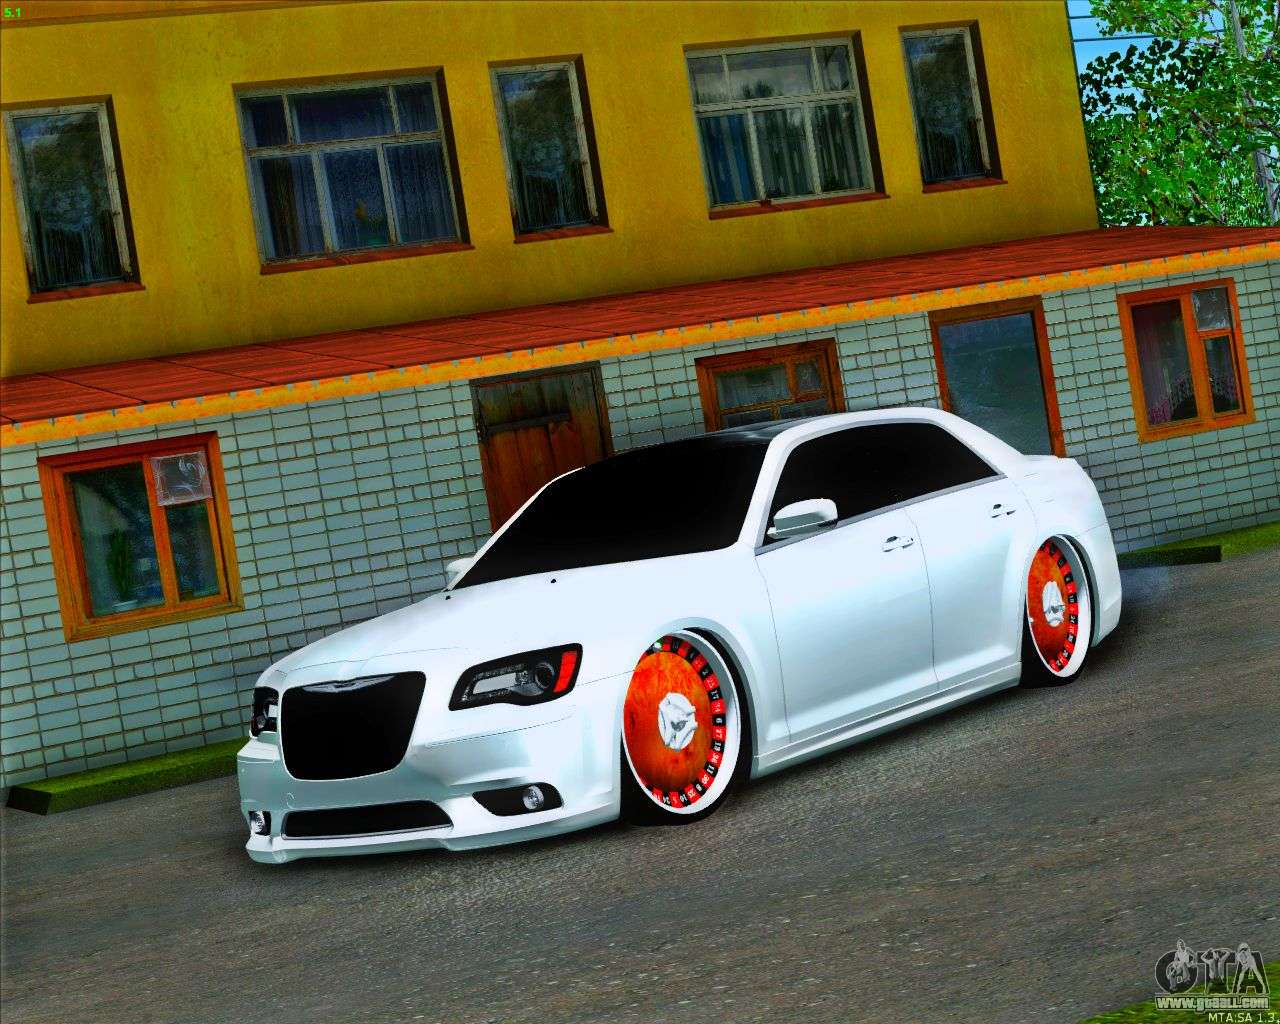 Chrysler 300 c SRT-8 MANSORY_CLUB for GTA San Andreas on gta 5 mitsubishi eclipse, gta 5 batmobile, gta 5 ferrari 250 gto, gta 5 mitsubishi galant, gta 5 volkswagen passat, gta 5 carbonizzare, gta 5 mitsubishi lancer, gta 5 eagle, gta 5 acura tl, gta 5 shelby mustang, gta 5 nissan 370z, gta 5 nissan gt-r, gta 5 holden commodore, gta 5 porsche 918, gta 5 jaguar x-type, gta 5 chevy malibu, gta 5 nissan 240sx, gta 5 ford bronco, gta 5 hennessey venom gt, gta 5 acura nsx,